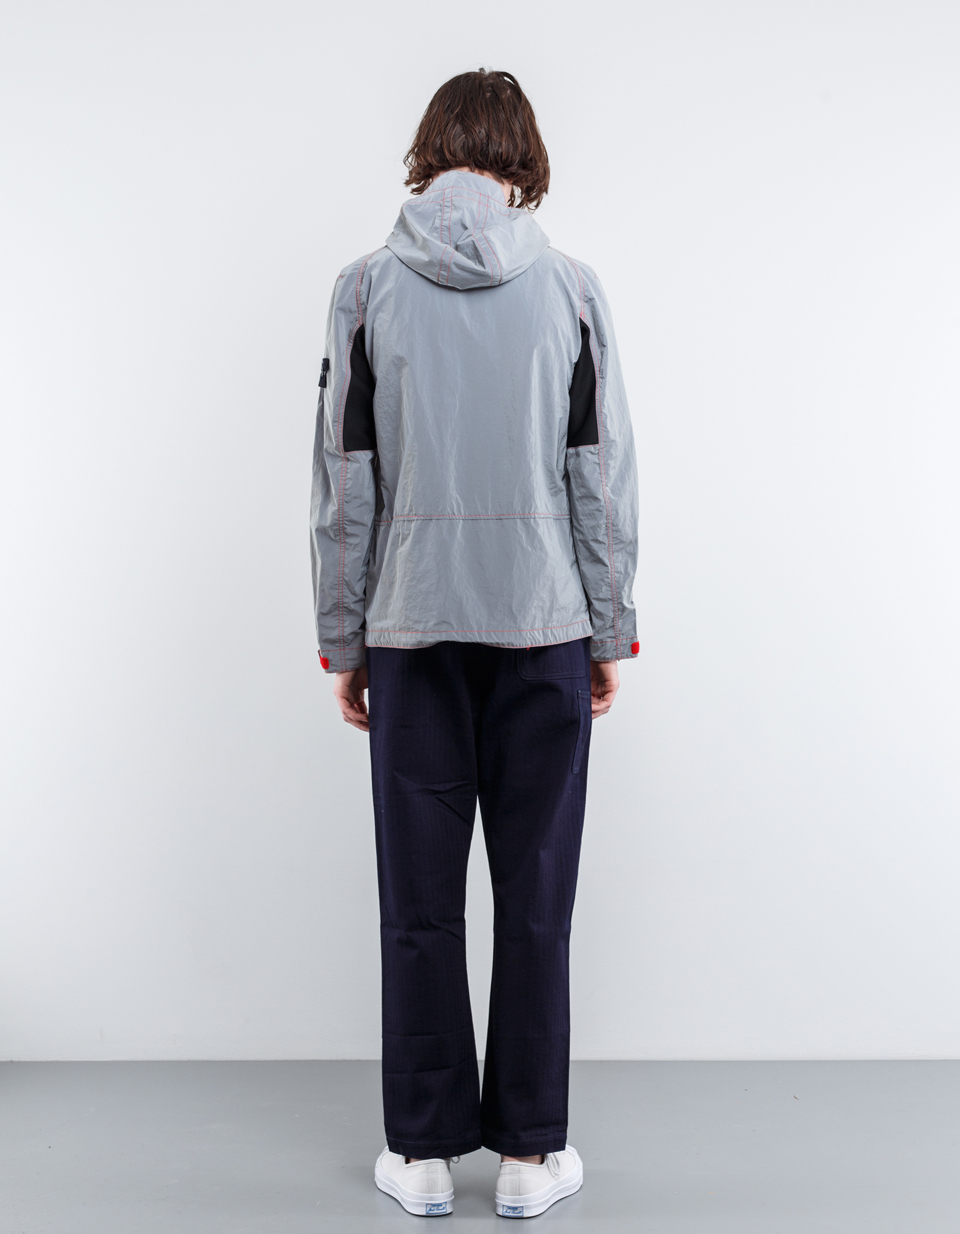 Stone Island Plated Reflective Jacket